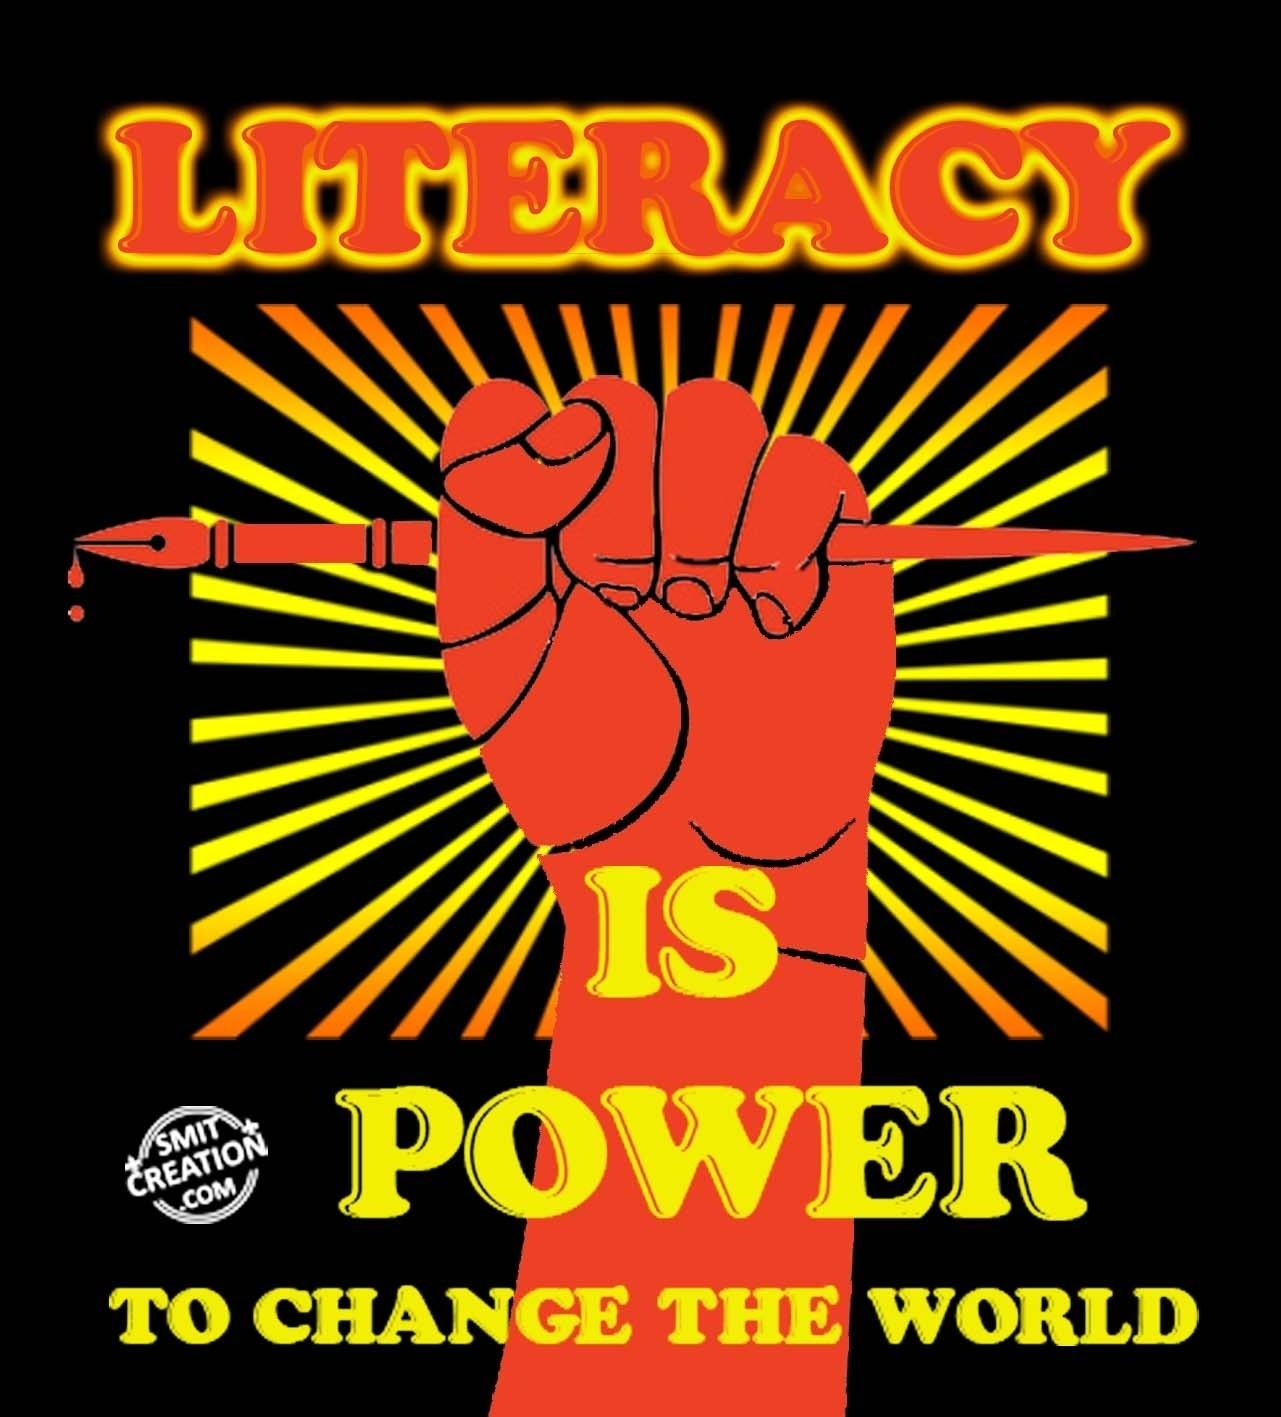 literacy is power to change the world smitcreationcom